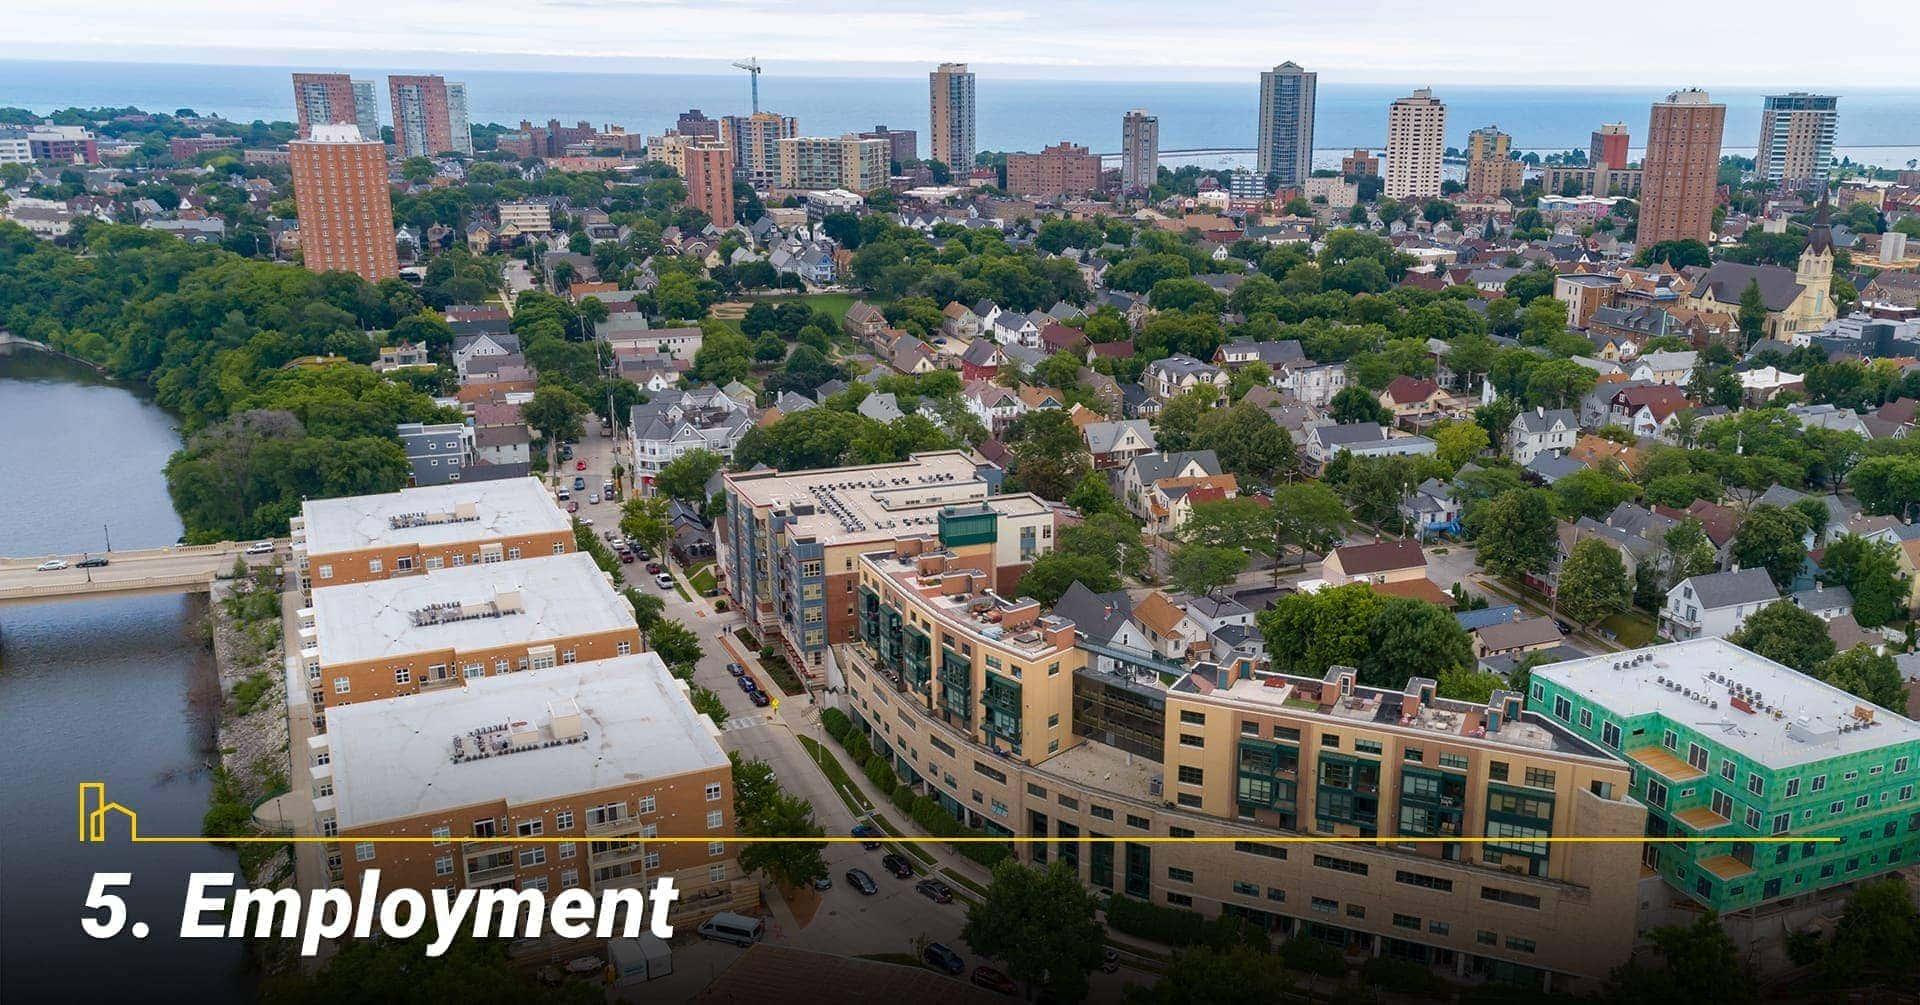 Employment in Milwaukee, WI